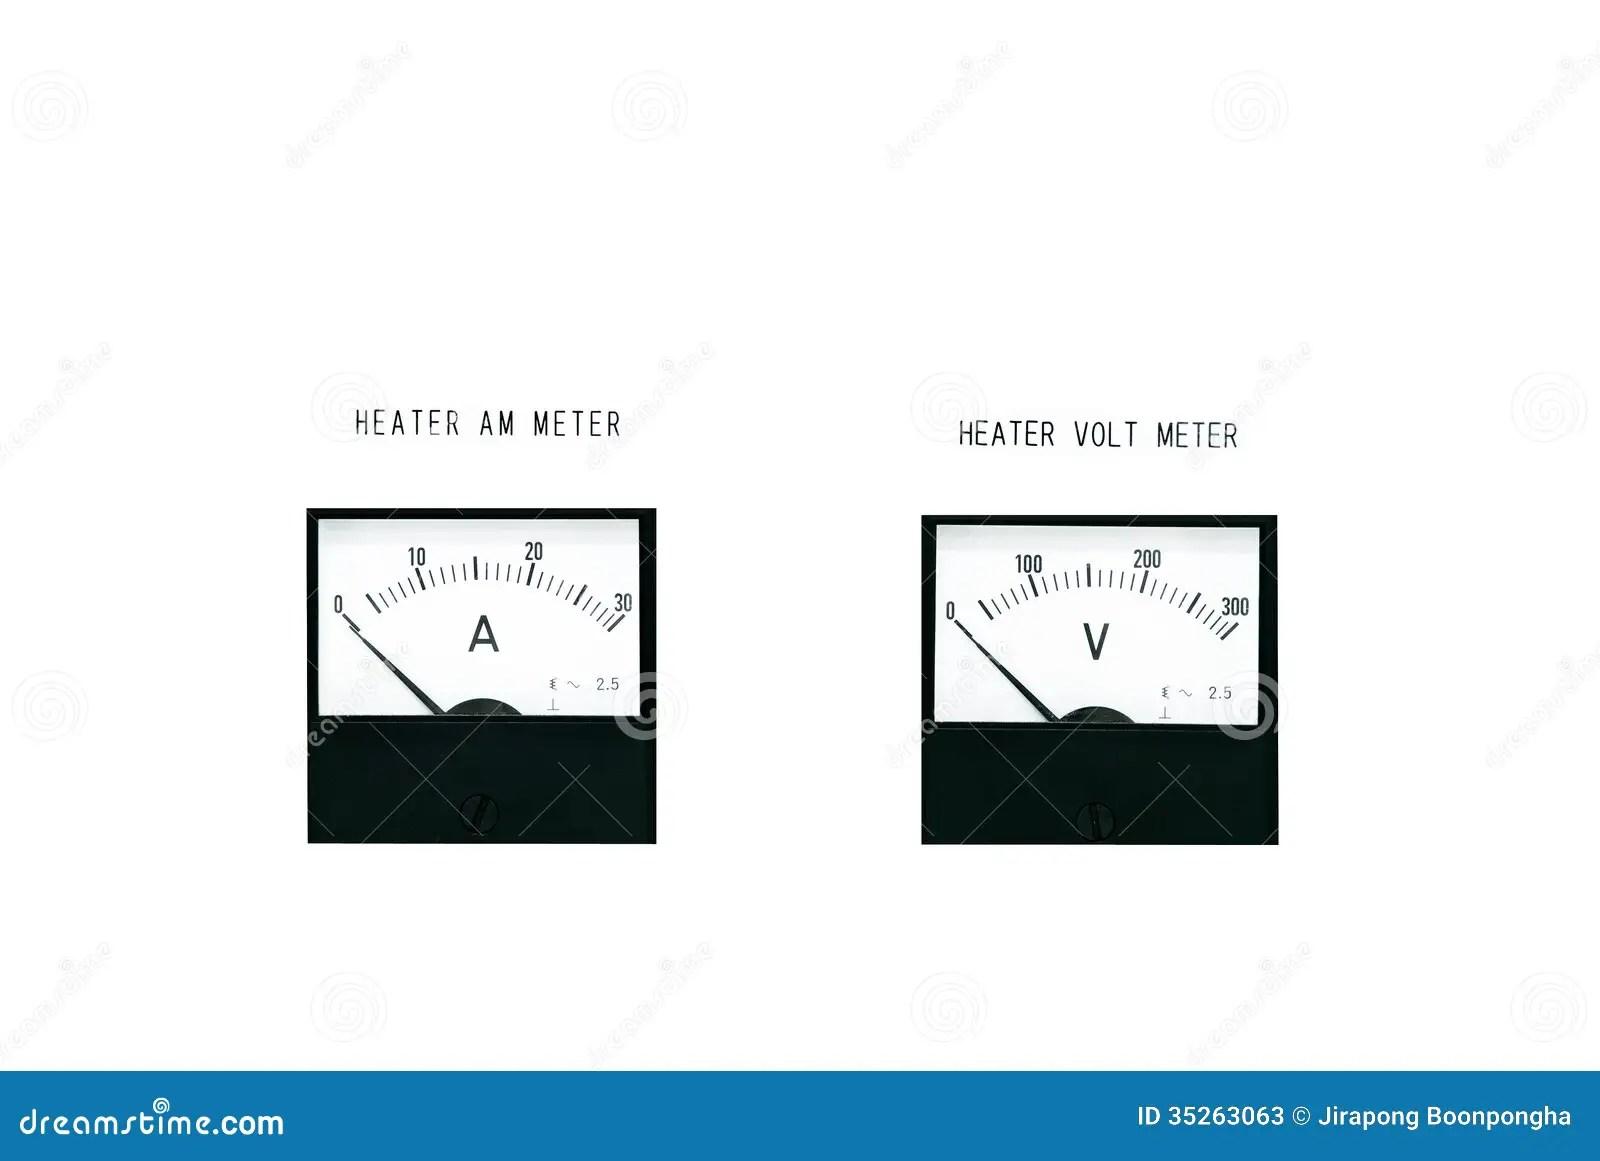 Amp Meter And Volt Meter Stock Photos